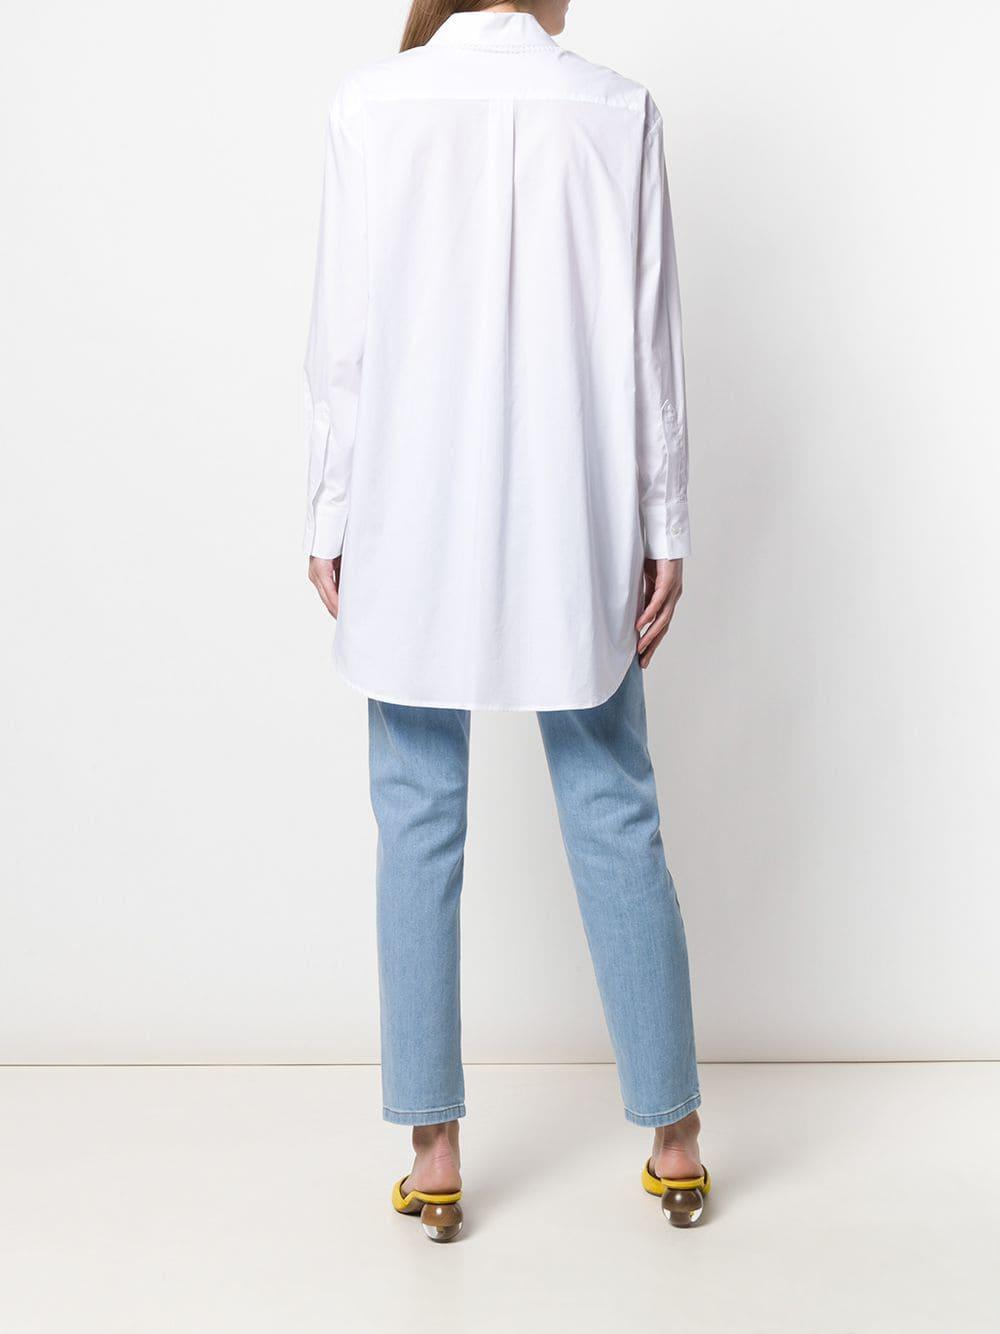 Chemise Giarrev Coton Vivetta en coloris Blanc